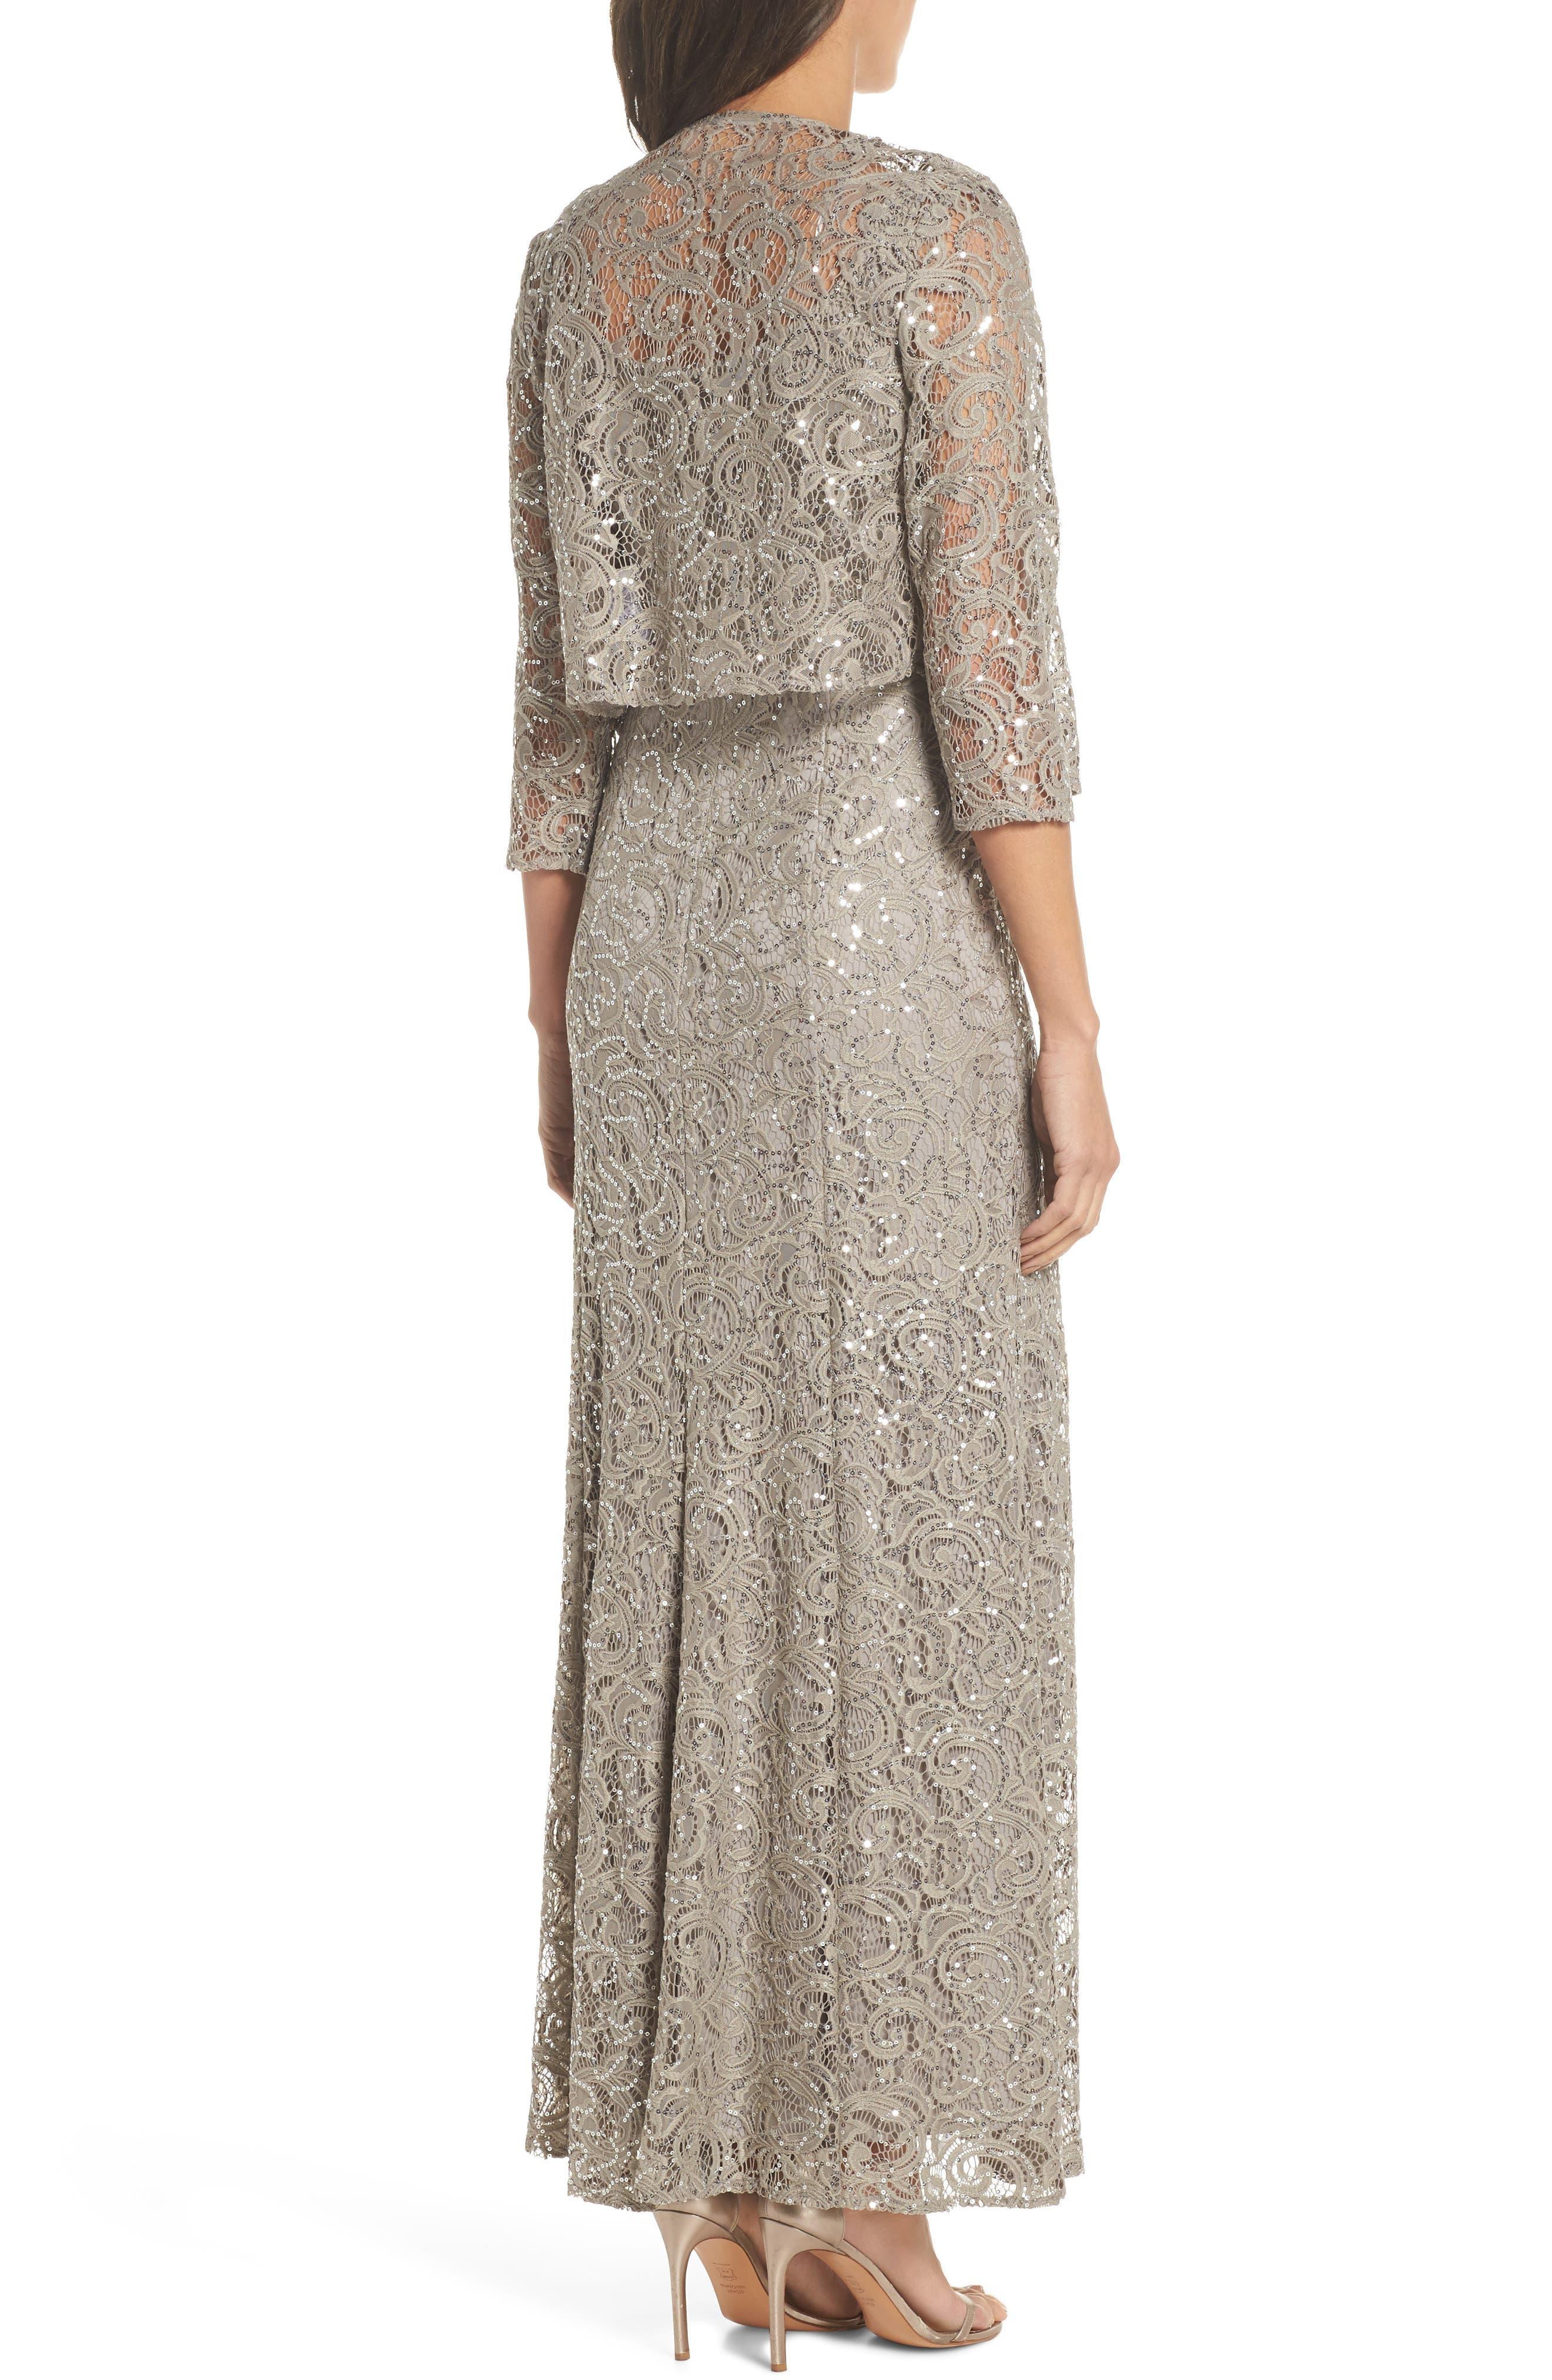 Sequin Lace Jacket Gown,                             Alternate thumbnail 2, color,                             020